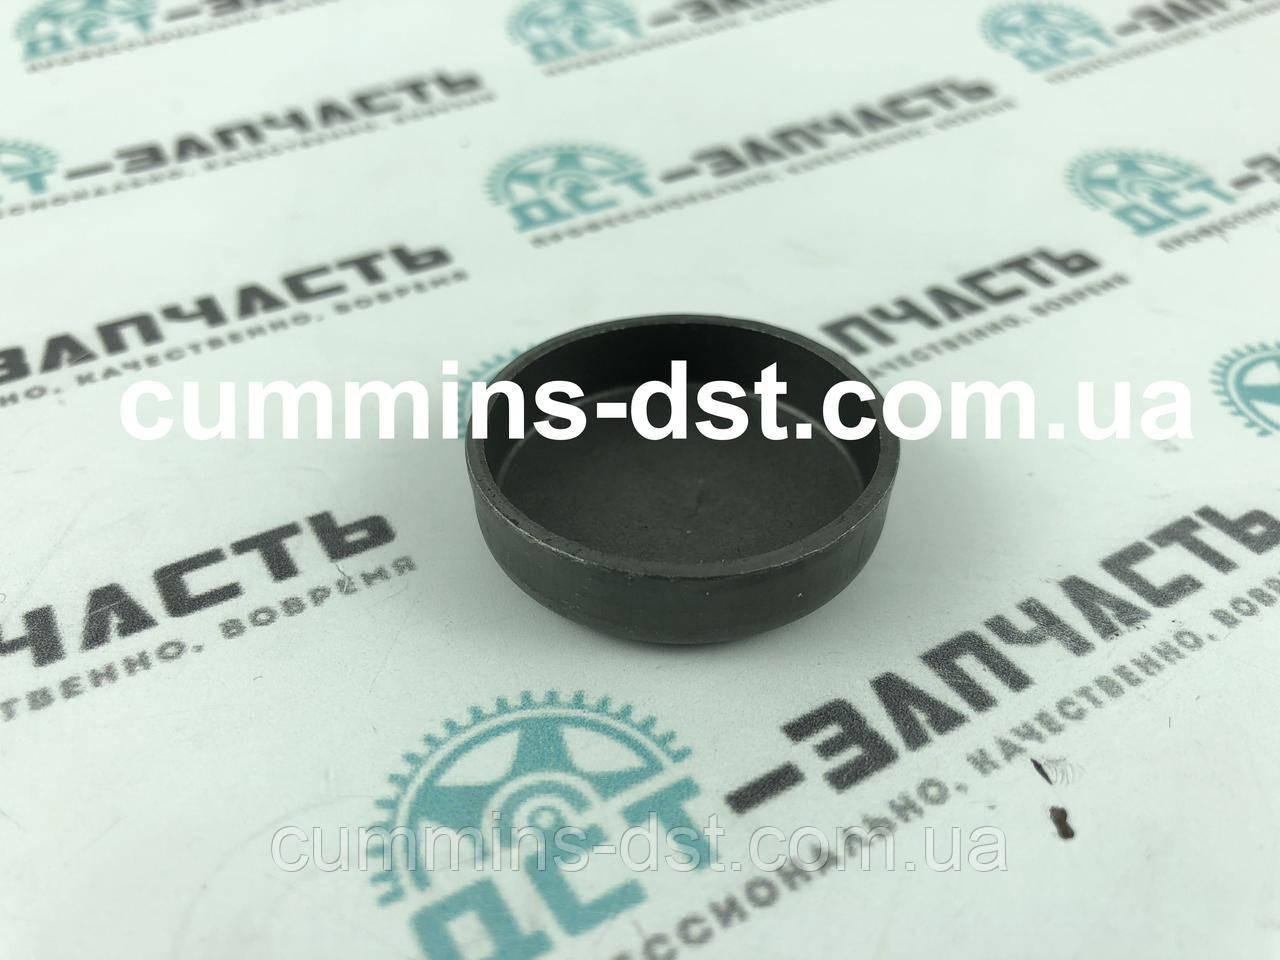 Заглушка блока цилиндров Deutz BF4M1013/BF6M1013 01179634